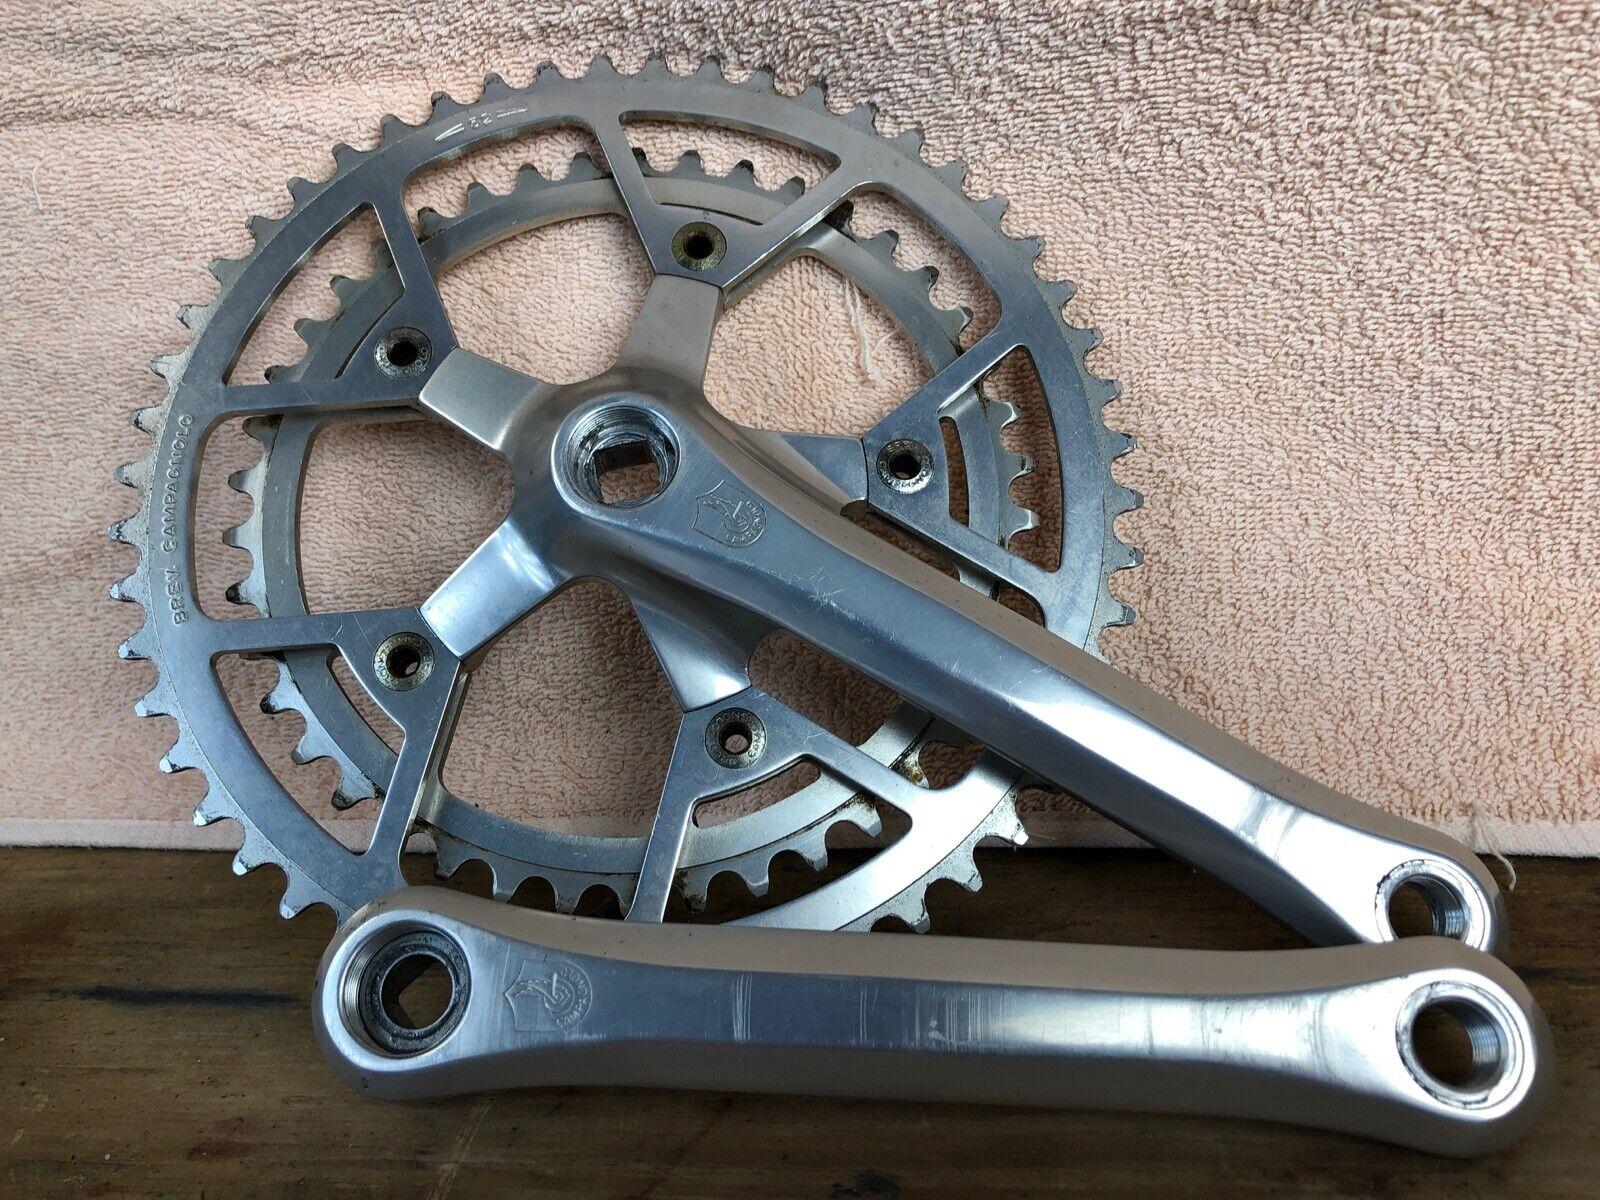 Campagnolo C Record Crankset - 170  42 52 1985 Road Bike Racing  40% off